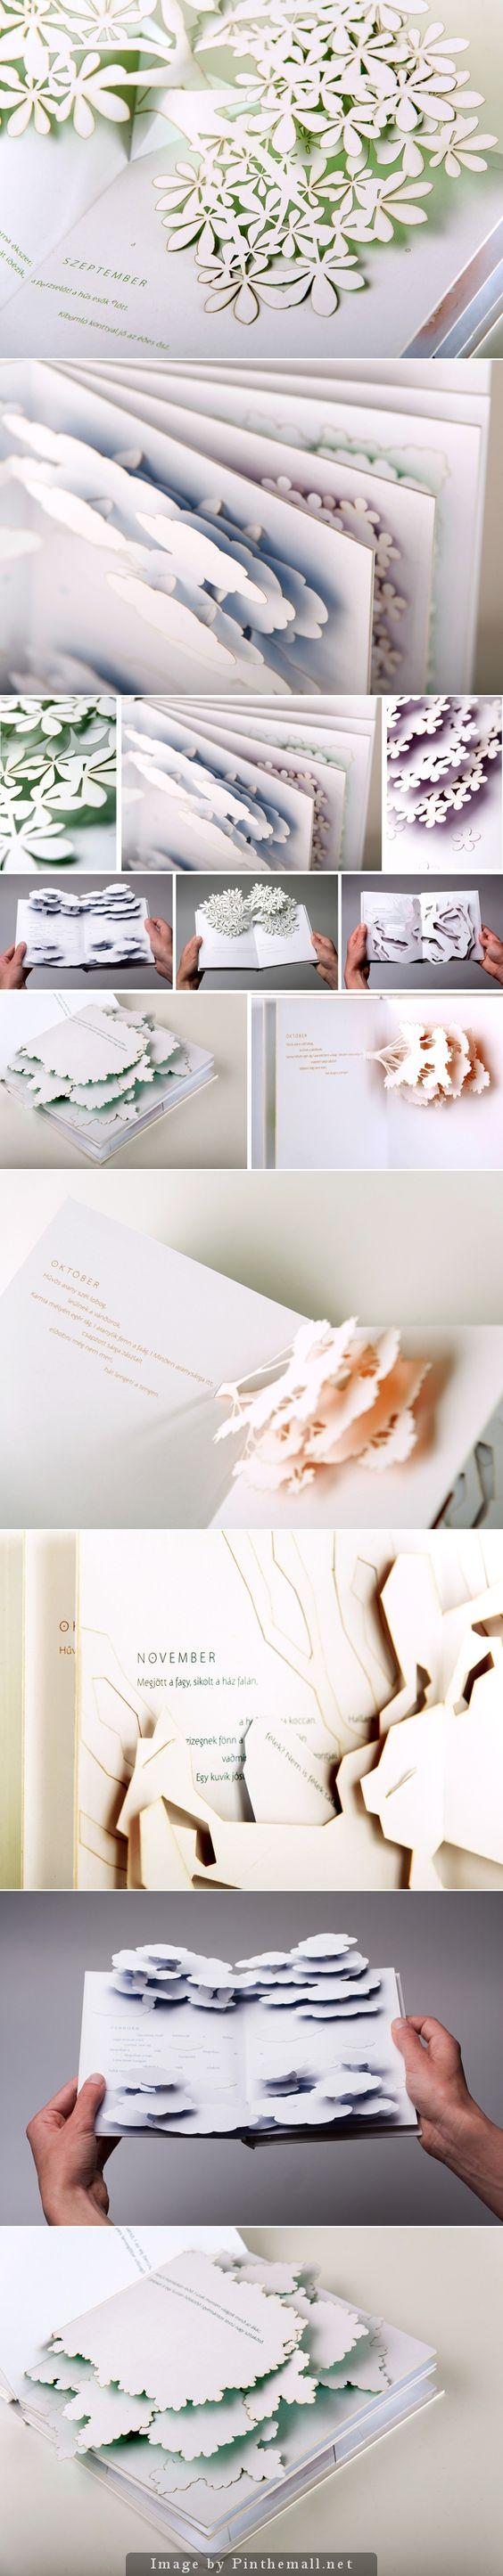 Paper + Book + Art | 紙 + 著作 + アート | книга + бумага + статья | Papier + Livre + Créations Artistiques | Carta + Libro + Arte | Calendar – Pop-up Poem Book by Éva Somogyi...